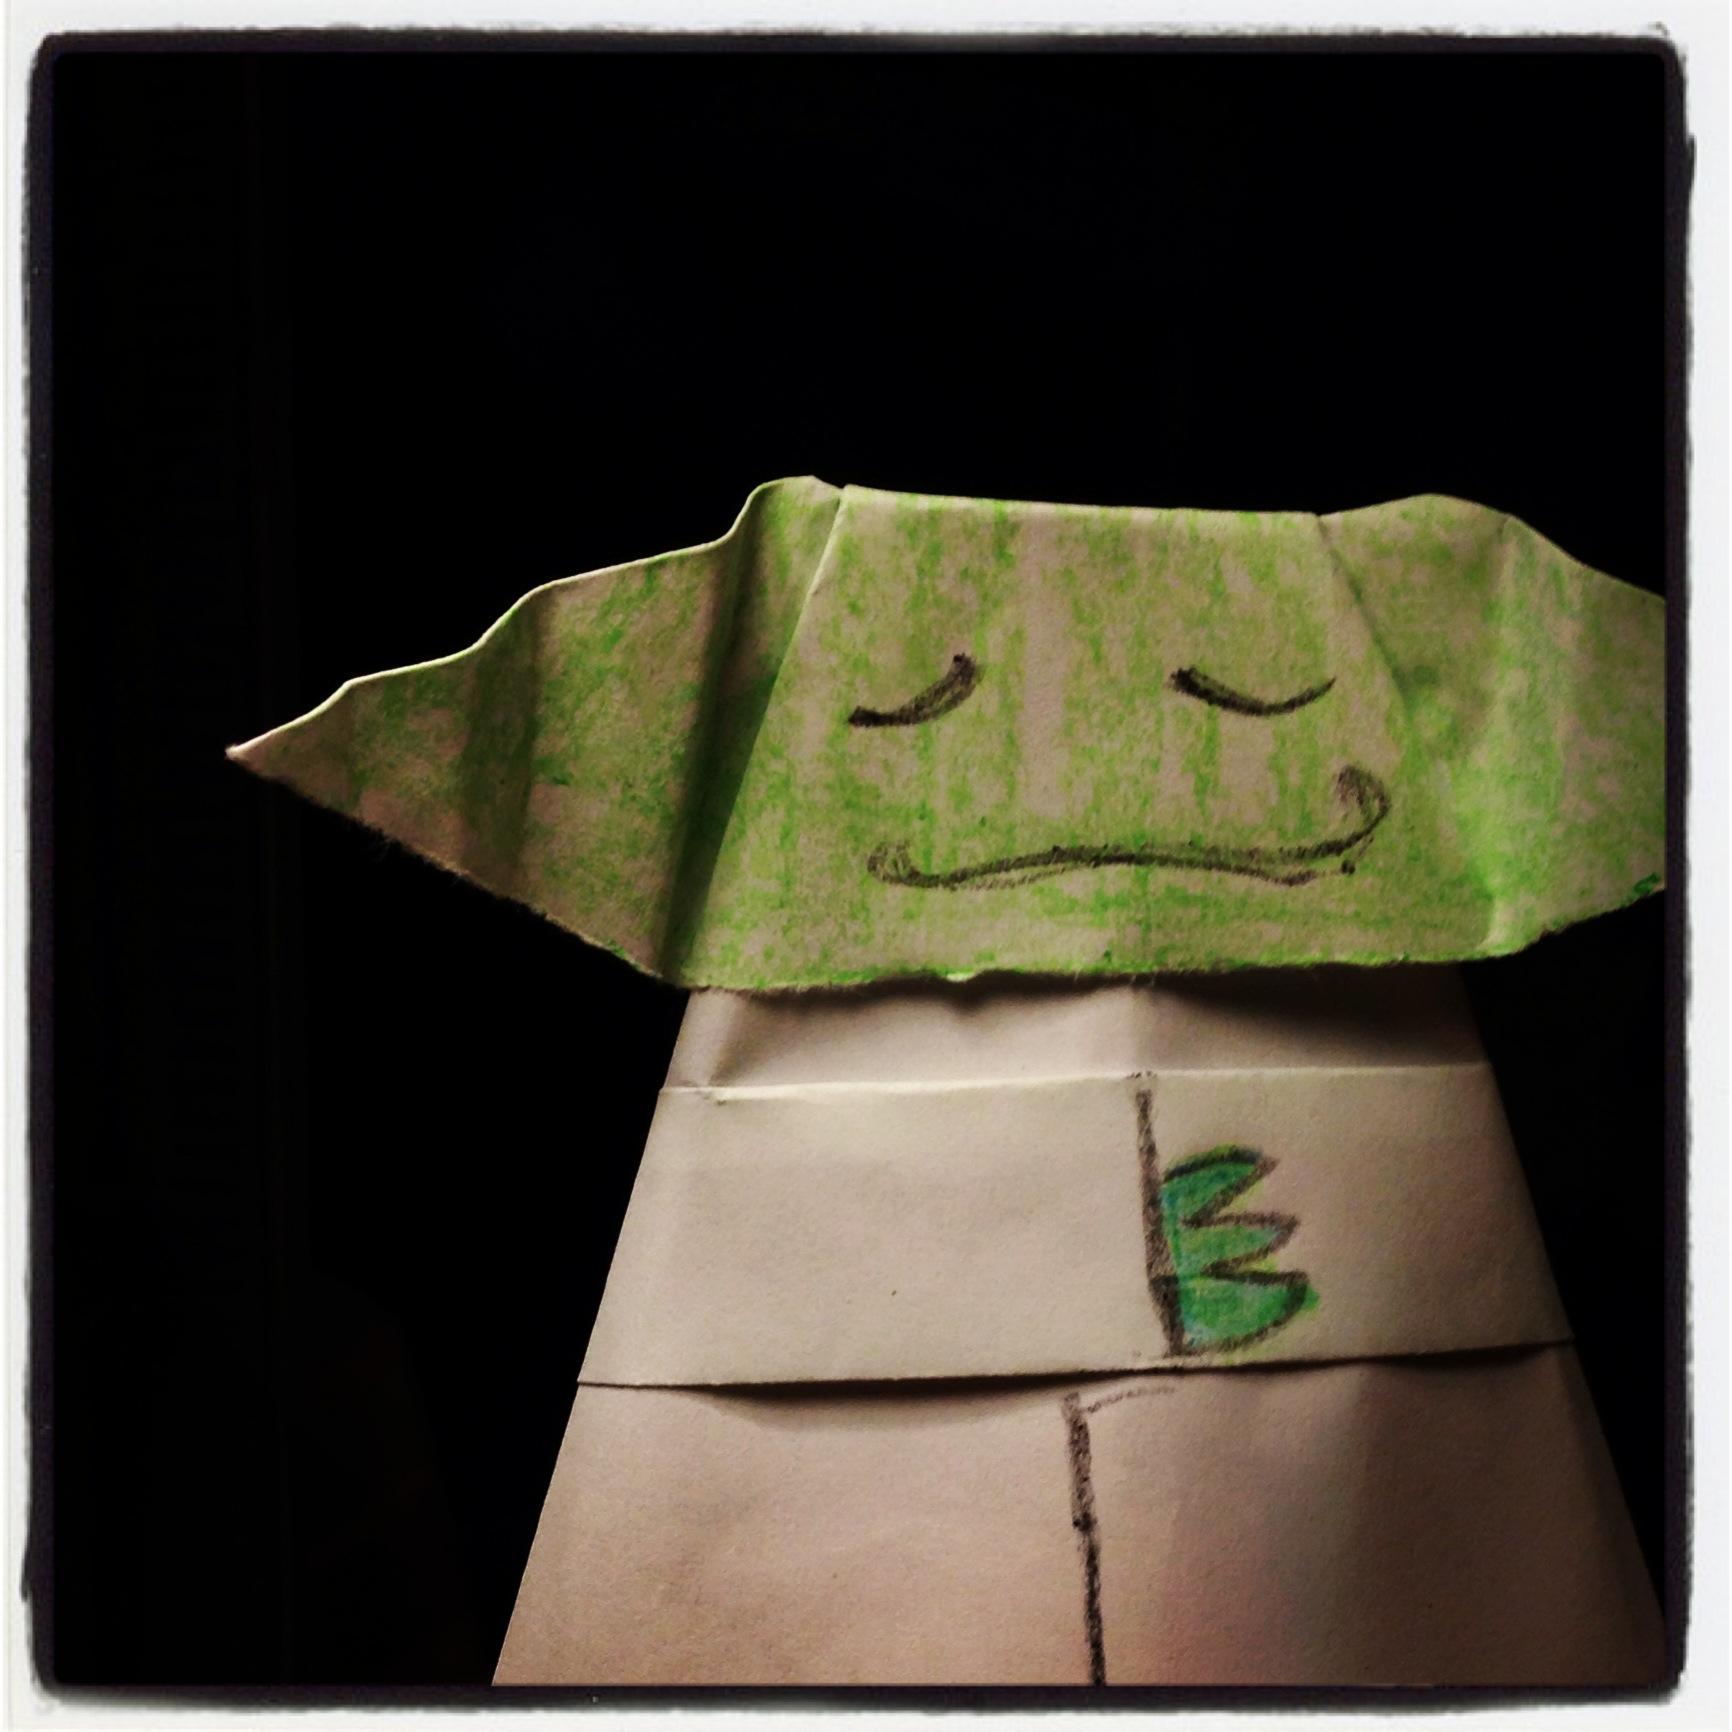 The Strange case Of Origami Yoda by kyle reed on Prezi Next | 1732x1732